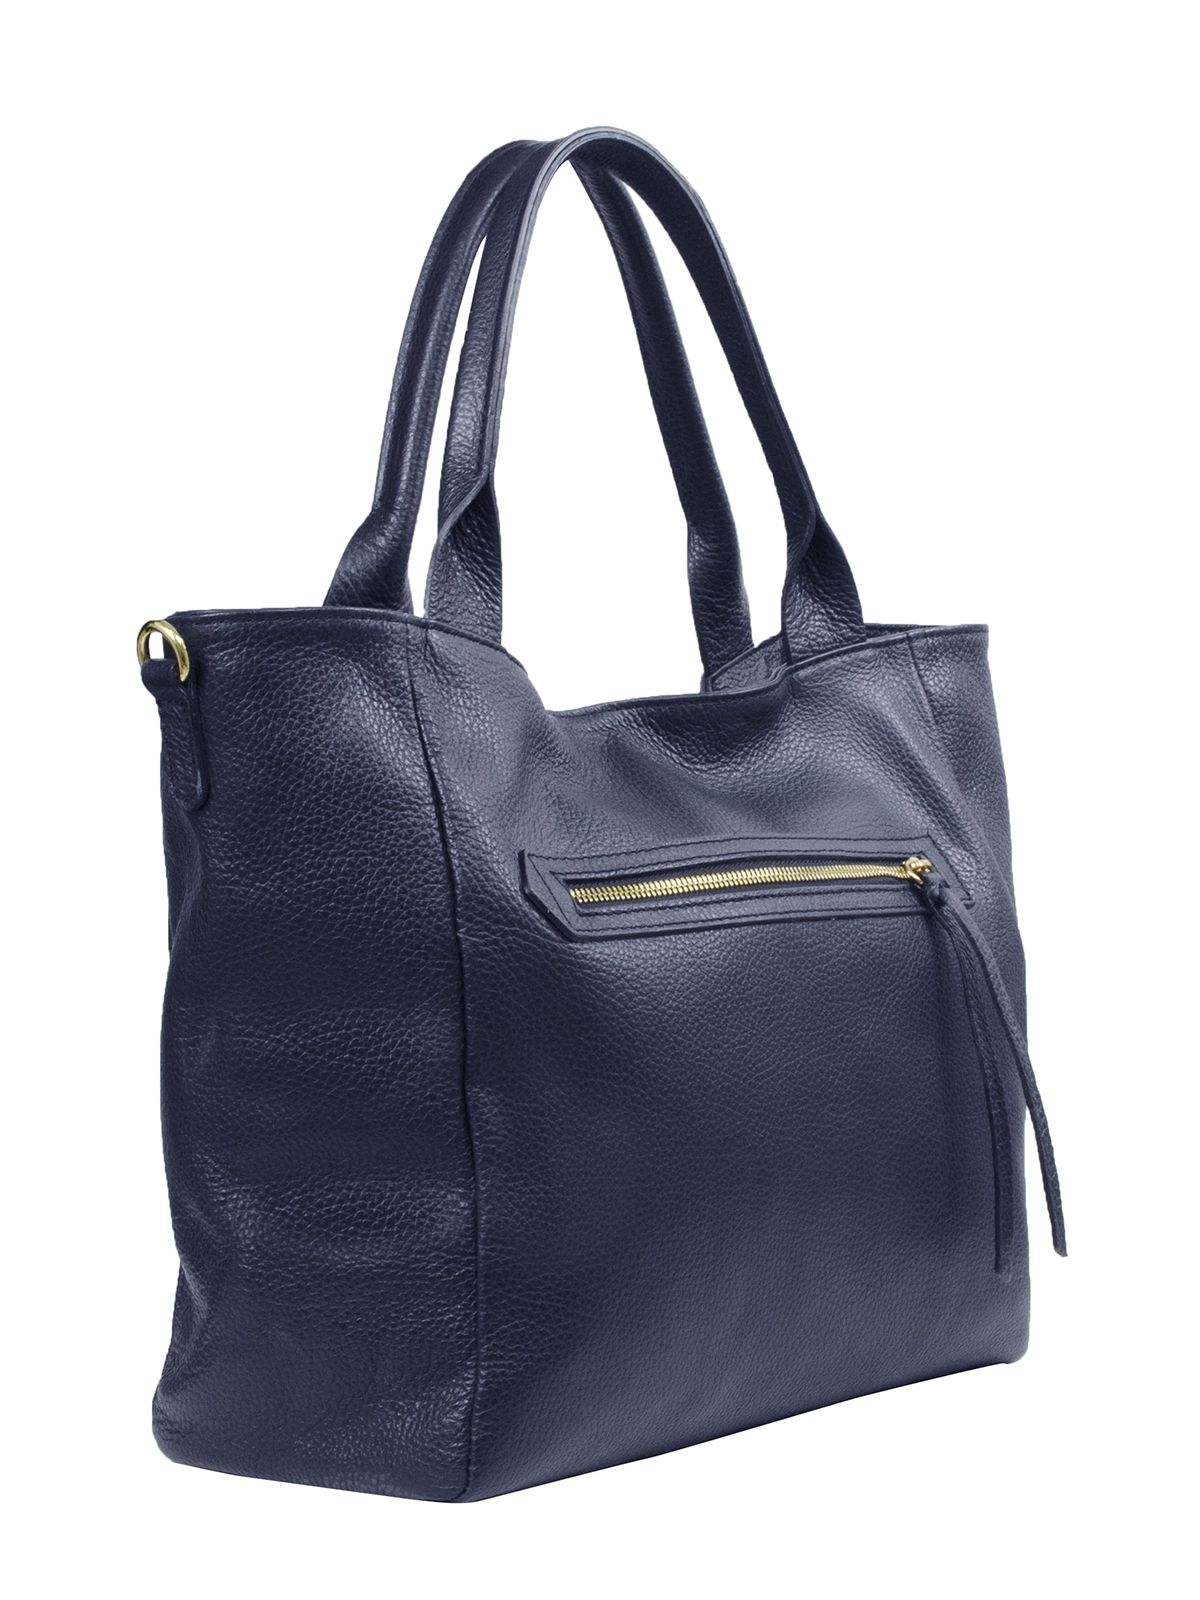 93898697febc Сумка синяя - ANNA VALENTINA - 2963594 | сумки | Bags и Fashion